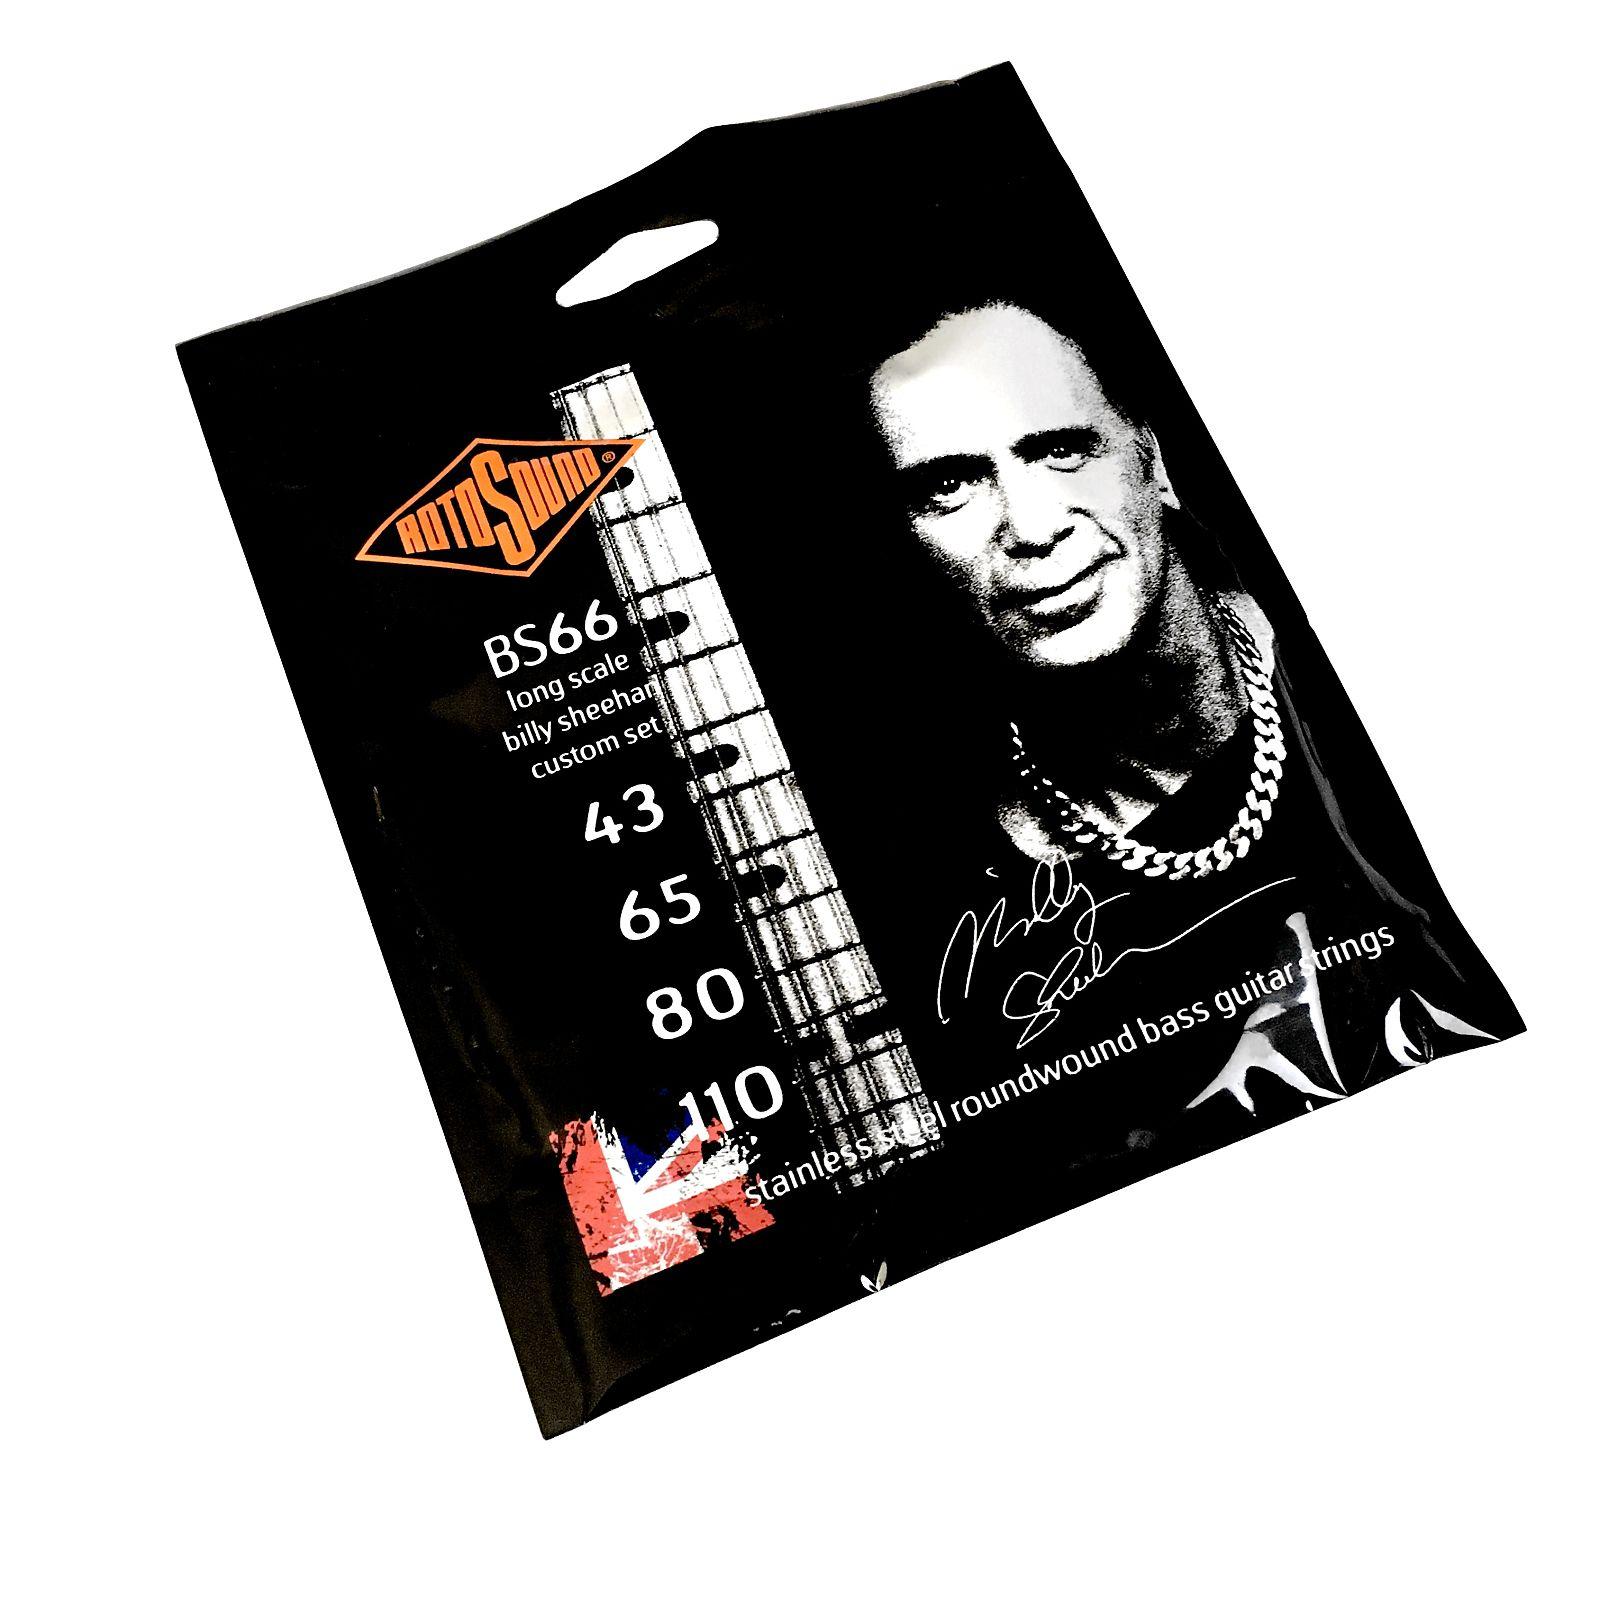 43-110 Rotosound BS66 Billy Sheehan Signature Bass Guitar Strings